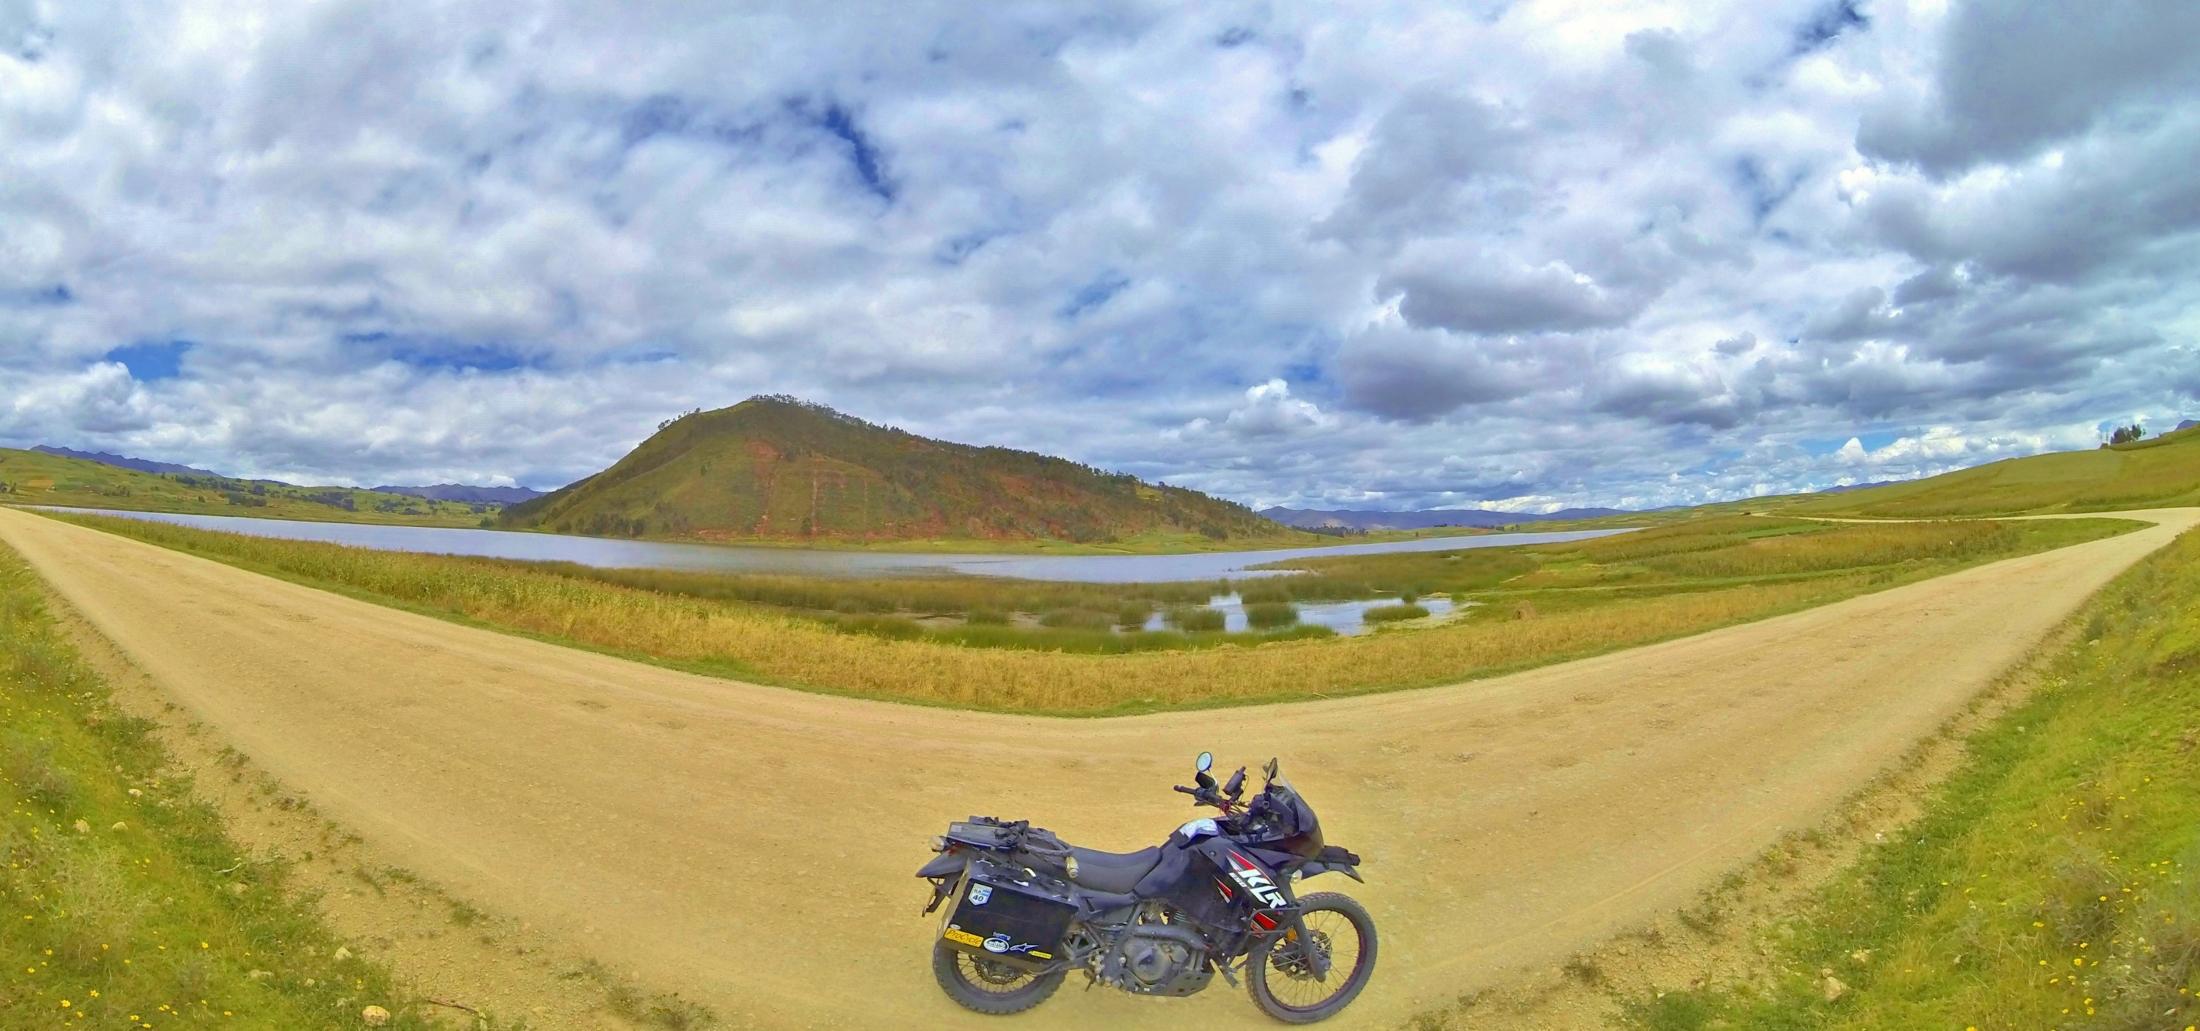 Laguna Huaypo, Valle Sagrado, Perú. Click for full-size image